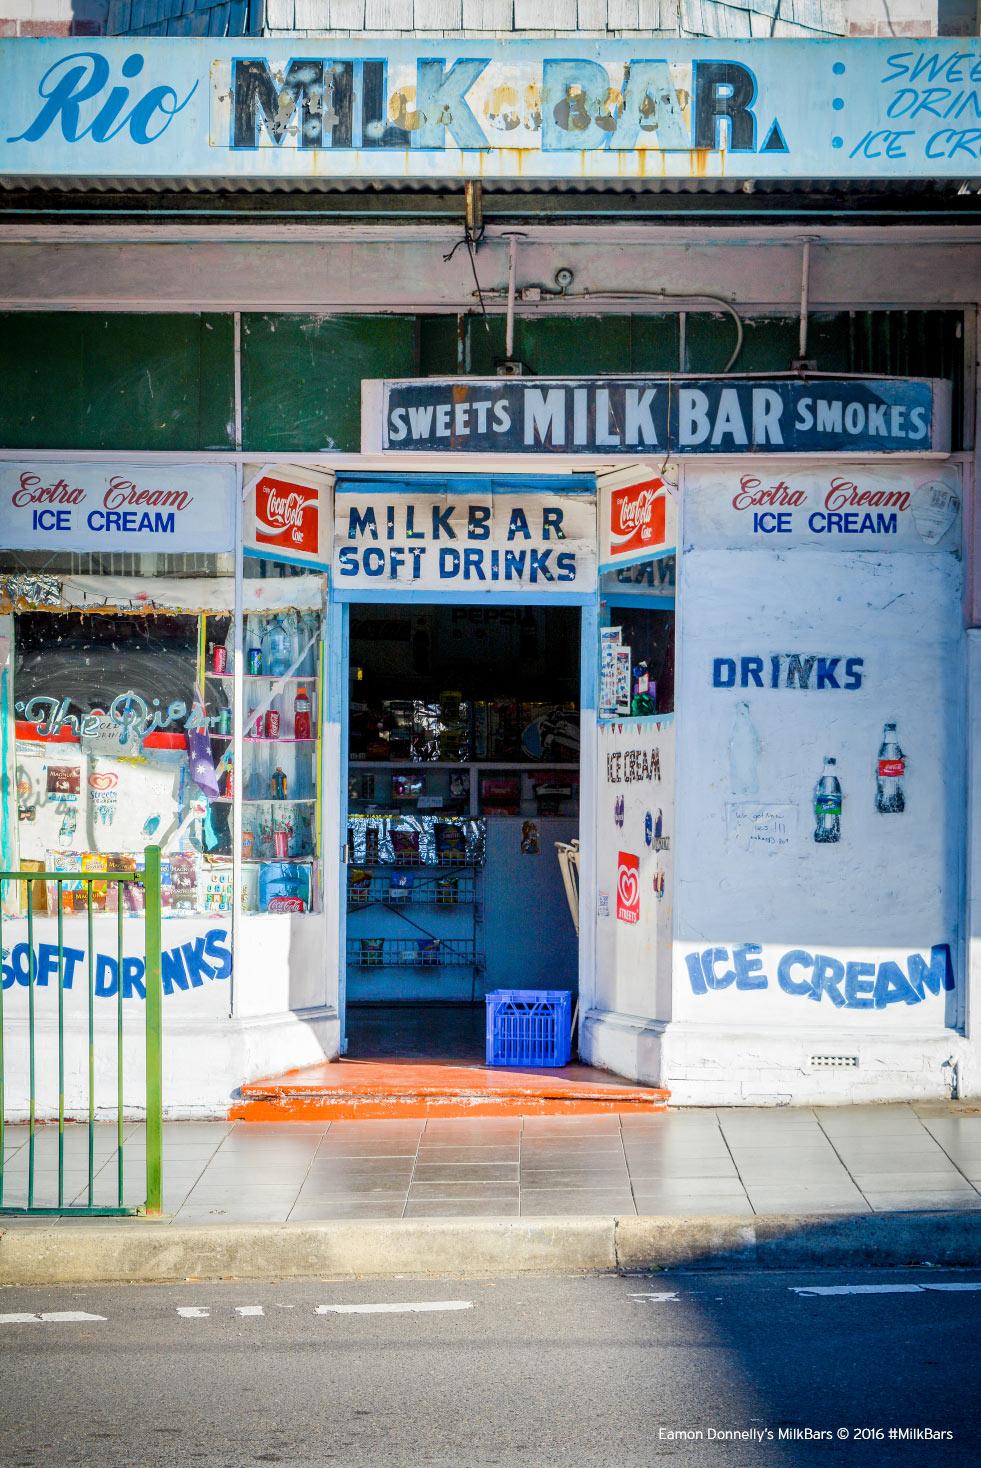 The-Rio-Milk-Bar-Eamon-Donnelly's-Milk-Bars-Book-Project-(c)-2001-2016.jpg